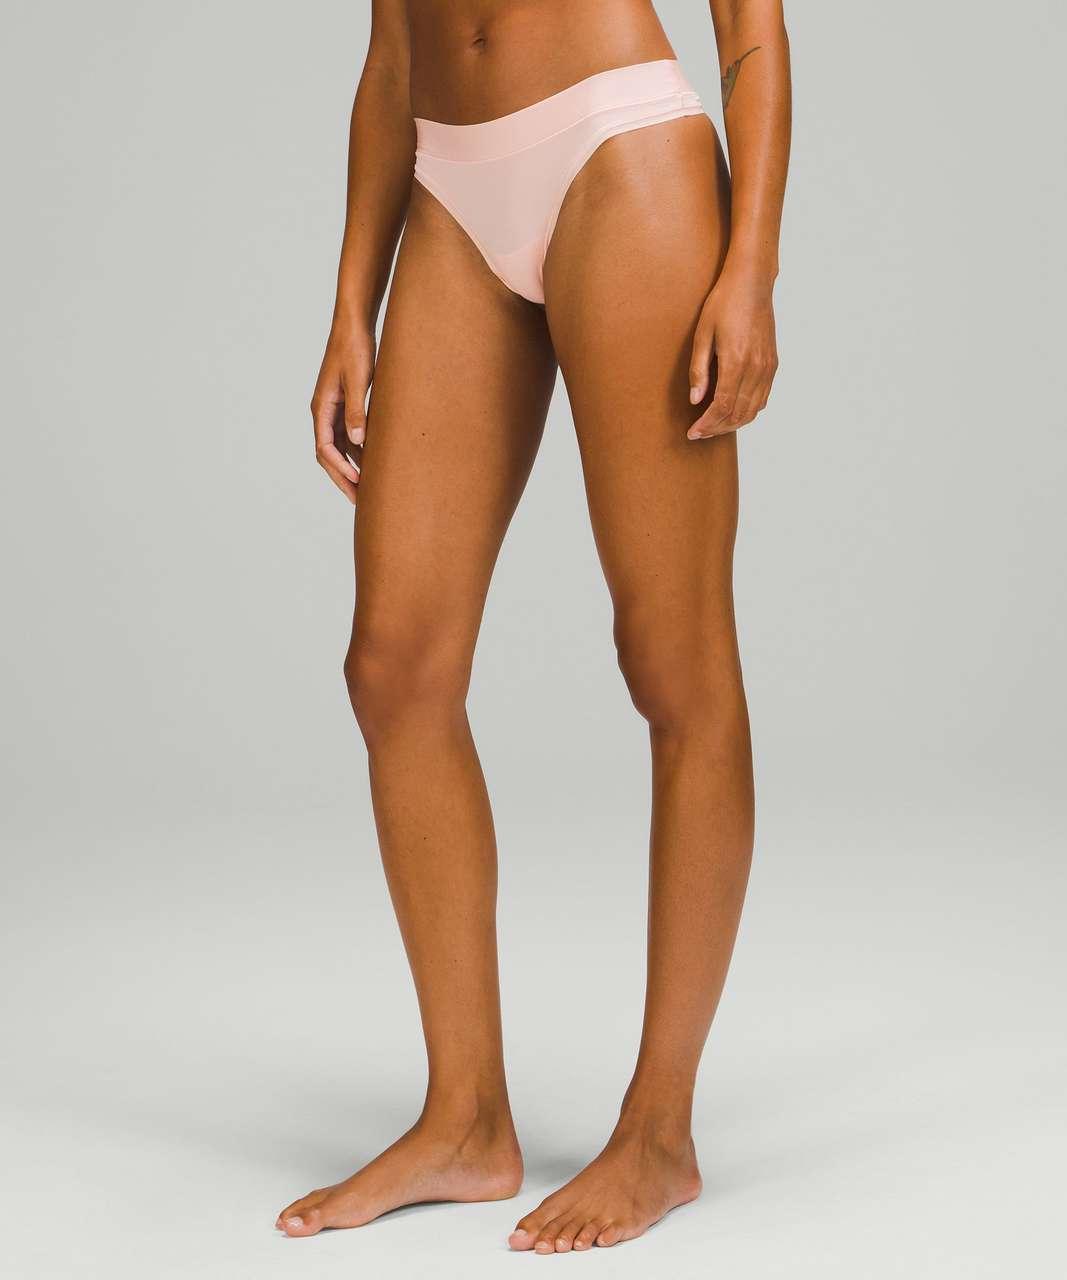 Lululemon UnderEase Mid Rise Thong Underwear 3 Pack - Heritage 365 Camo Mini Pecan Tan Multi / Pink Mist / Black